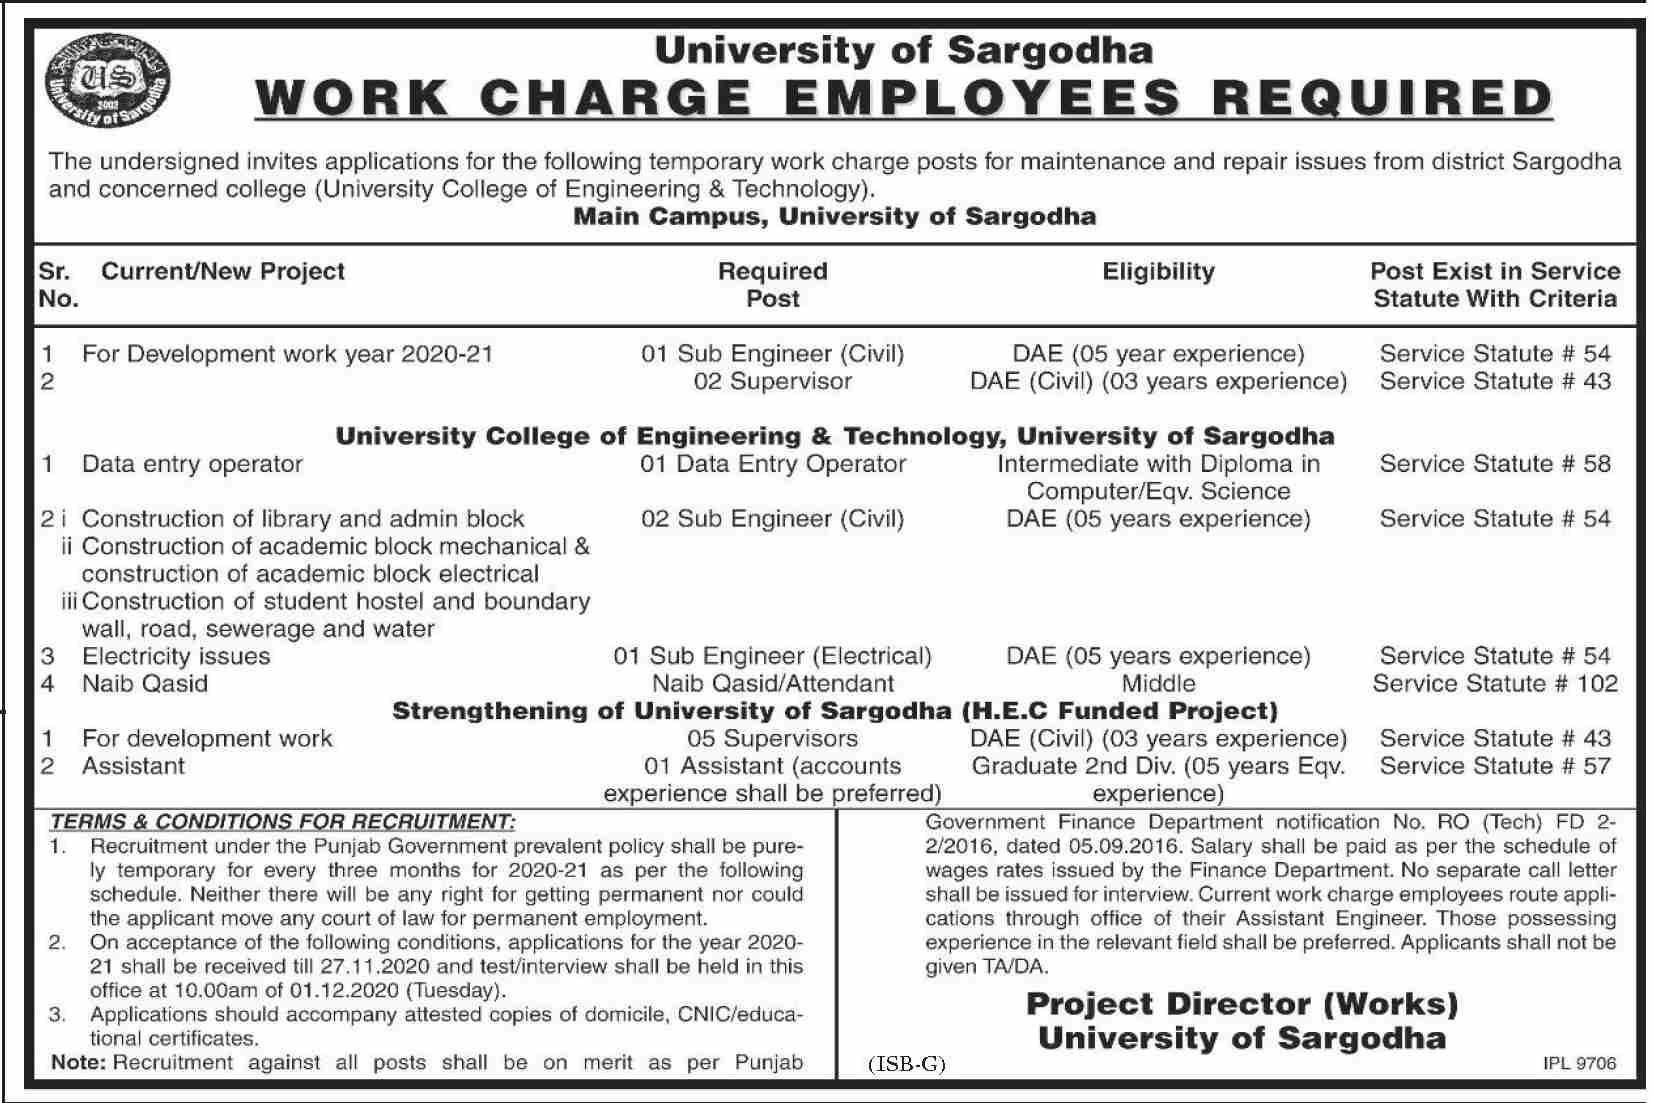 University Of Sargodha November 2020 Job Advertisement in Pakistan 2020